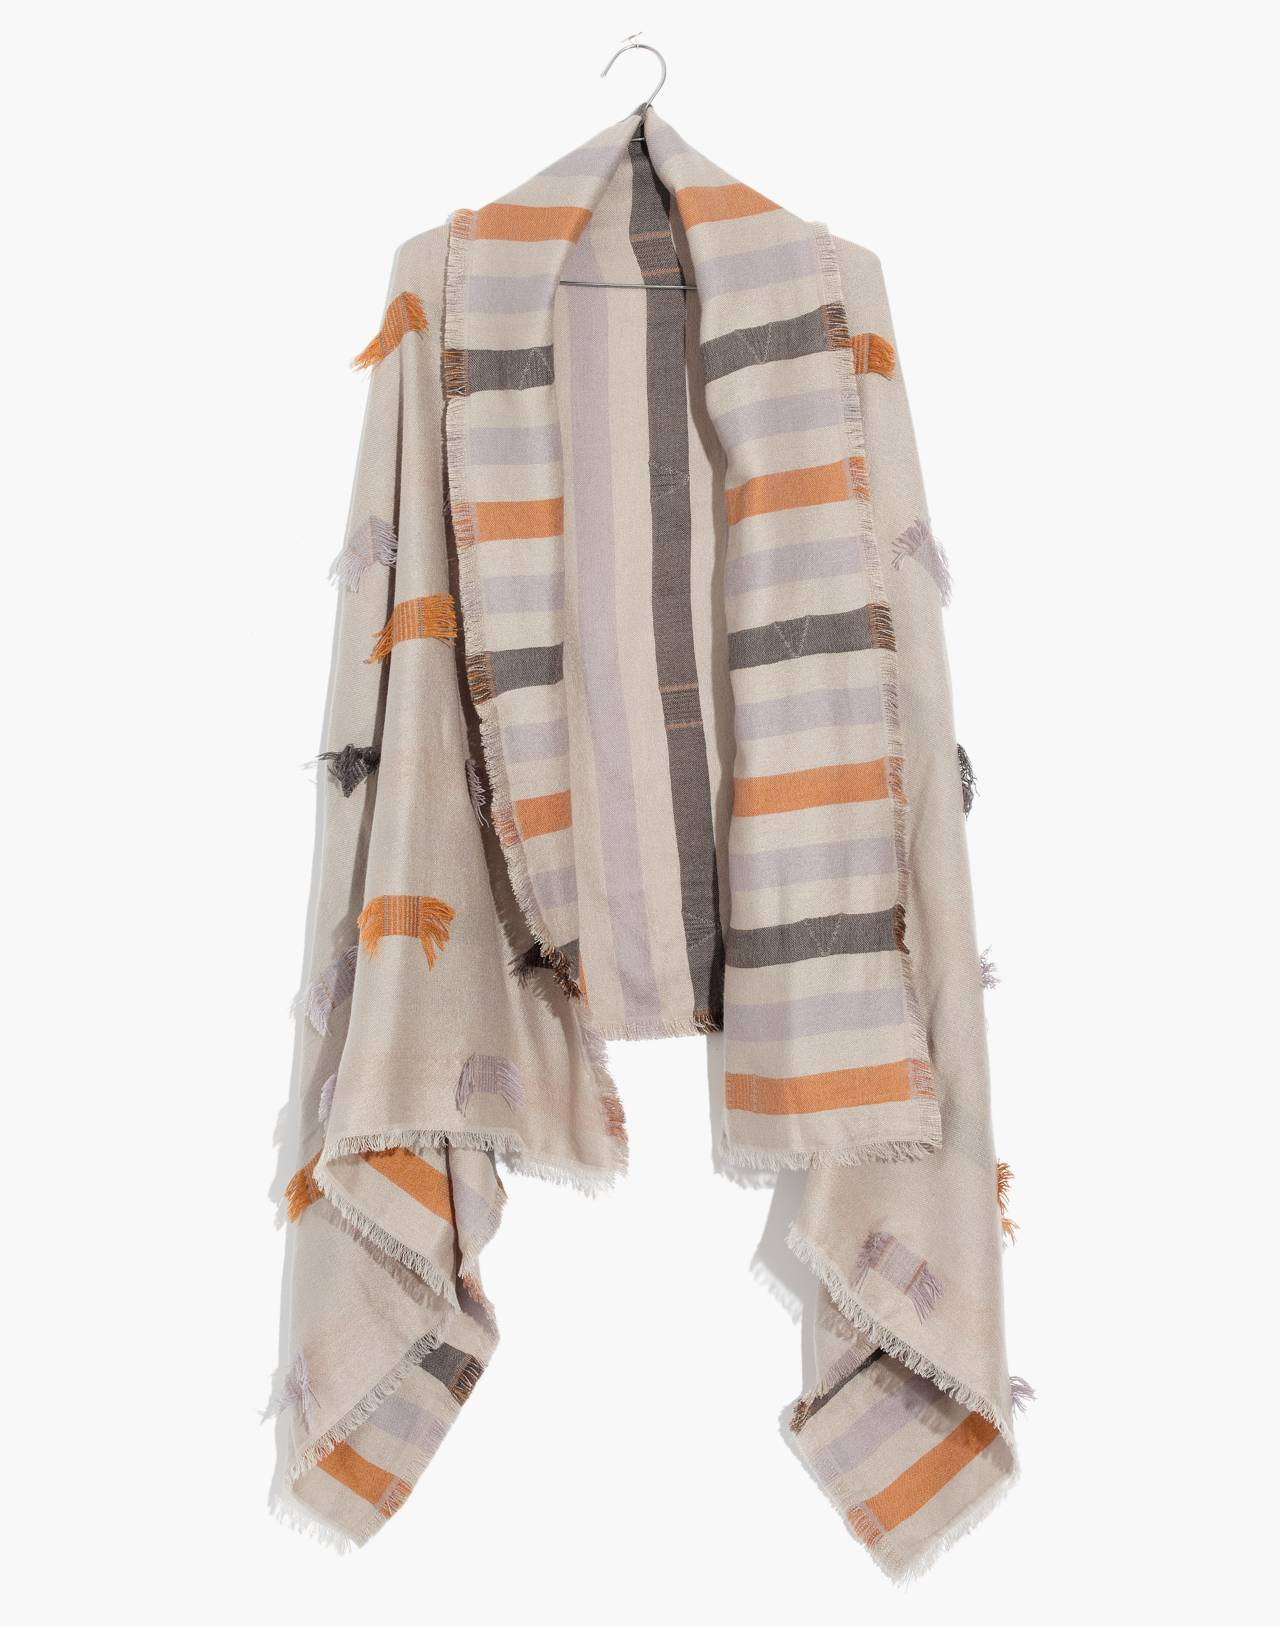 Fringe-Stripe Jacquard Scarf in smoked graphite multi image 1